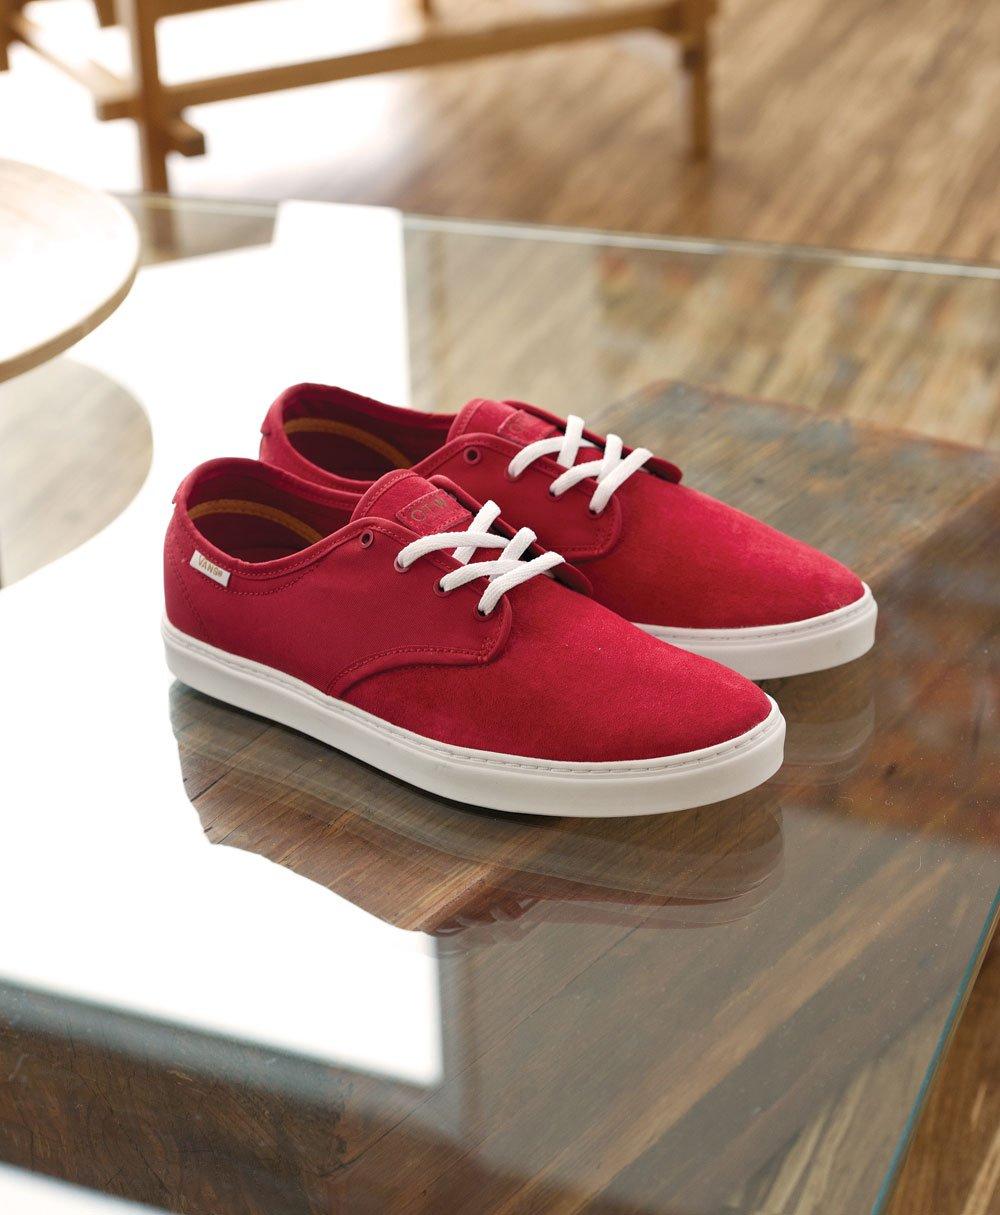 Vans-OTW-Collection_Ludlow_Running-Red_Spring-2013_hero